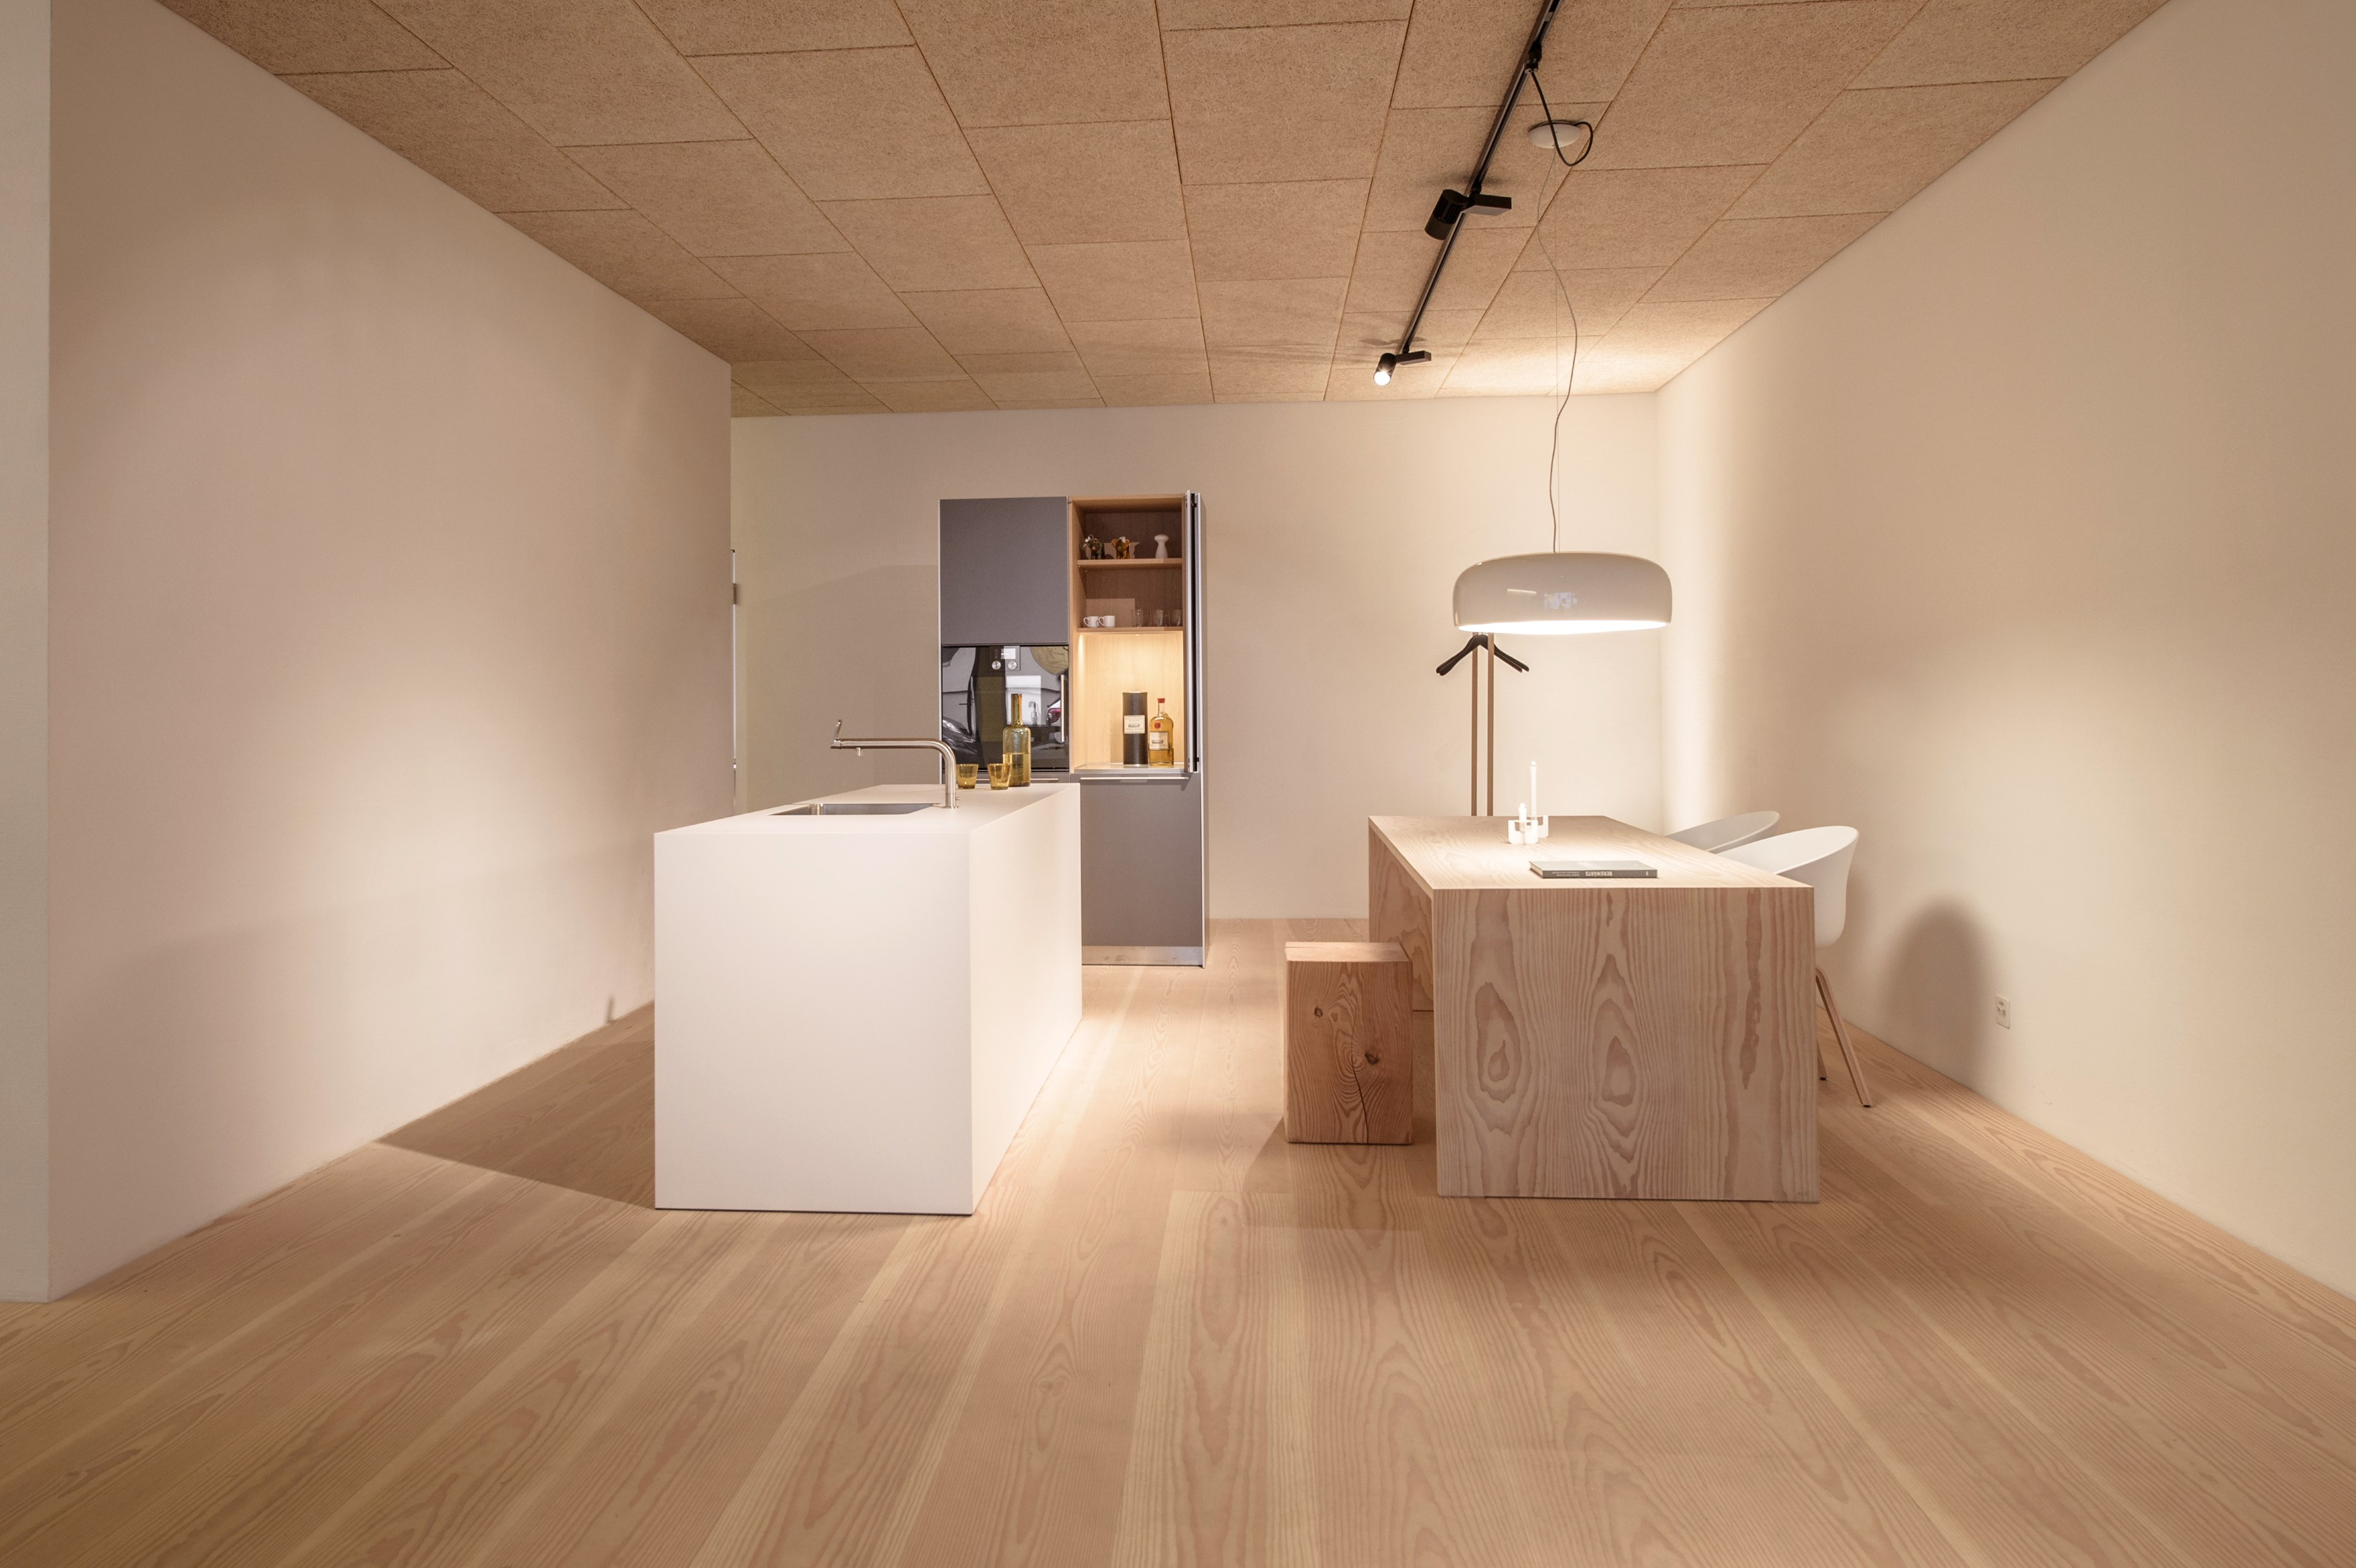 douglasie interiorpark. Black Bedroom Furniture Sets. Home Design Ideas